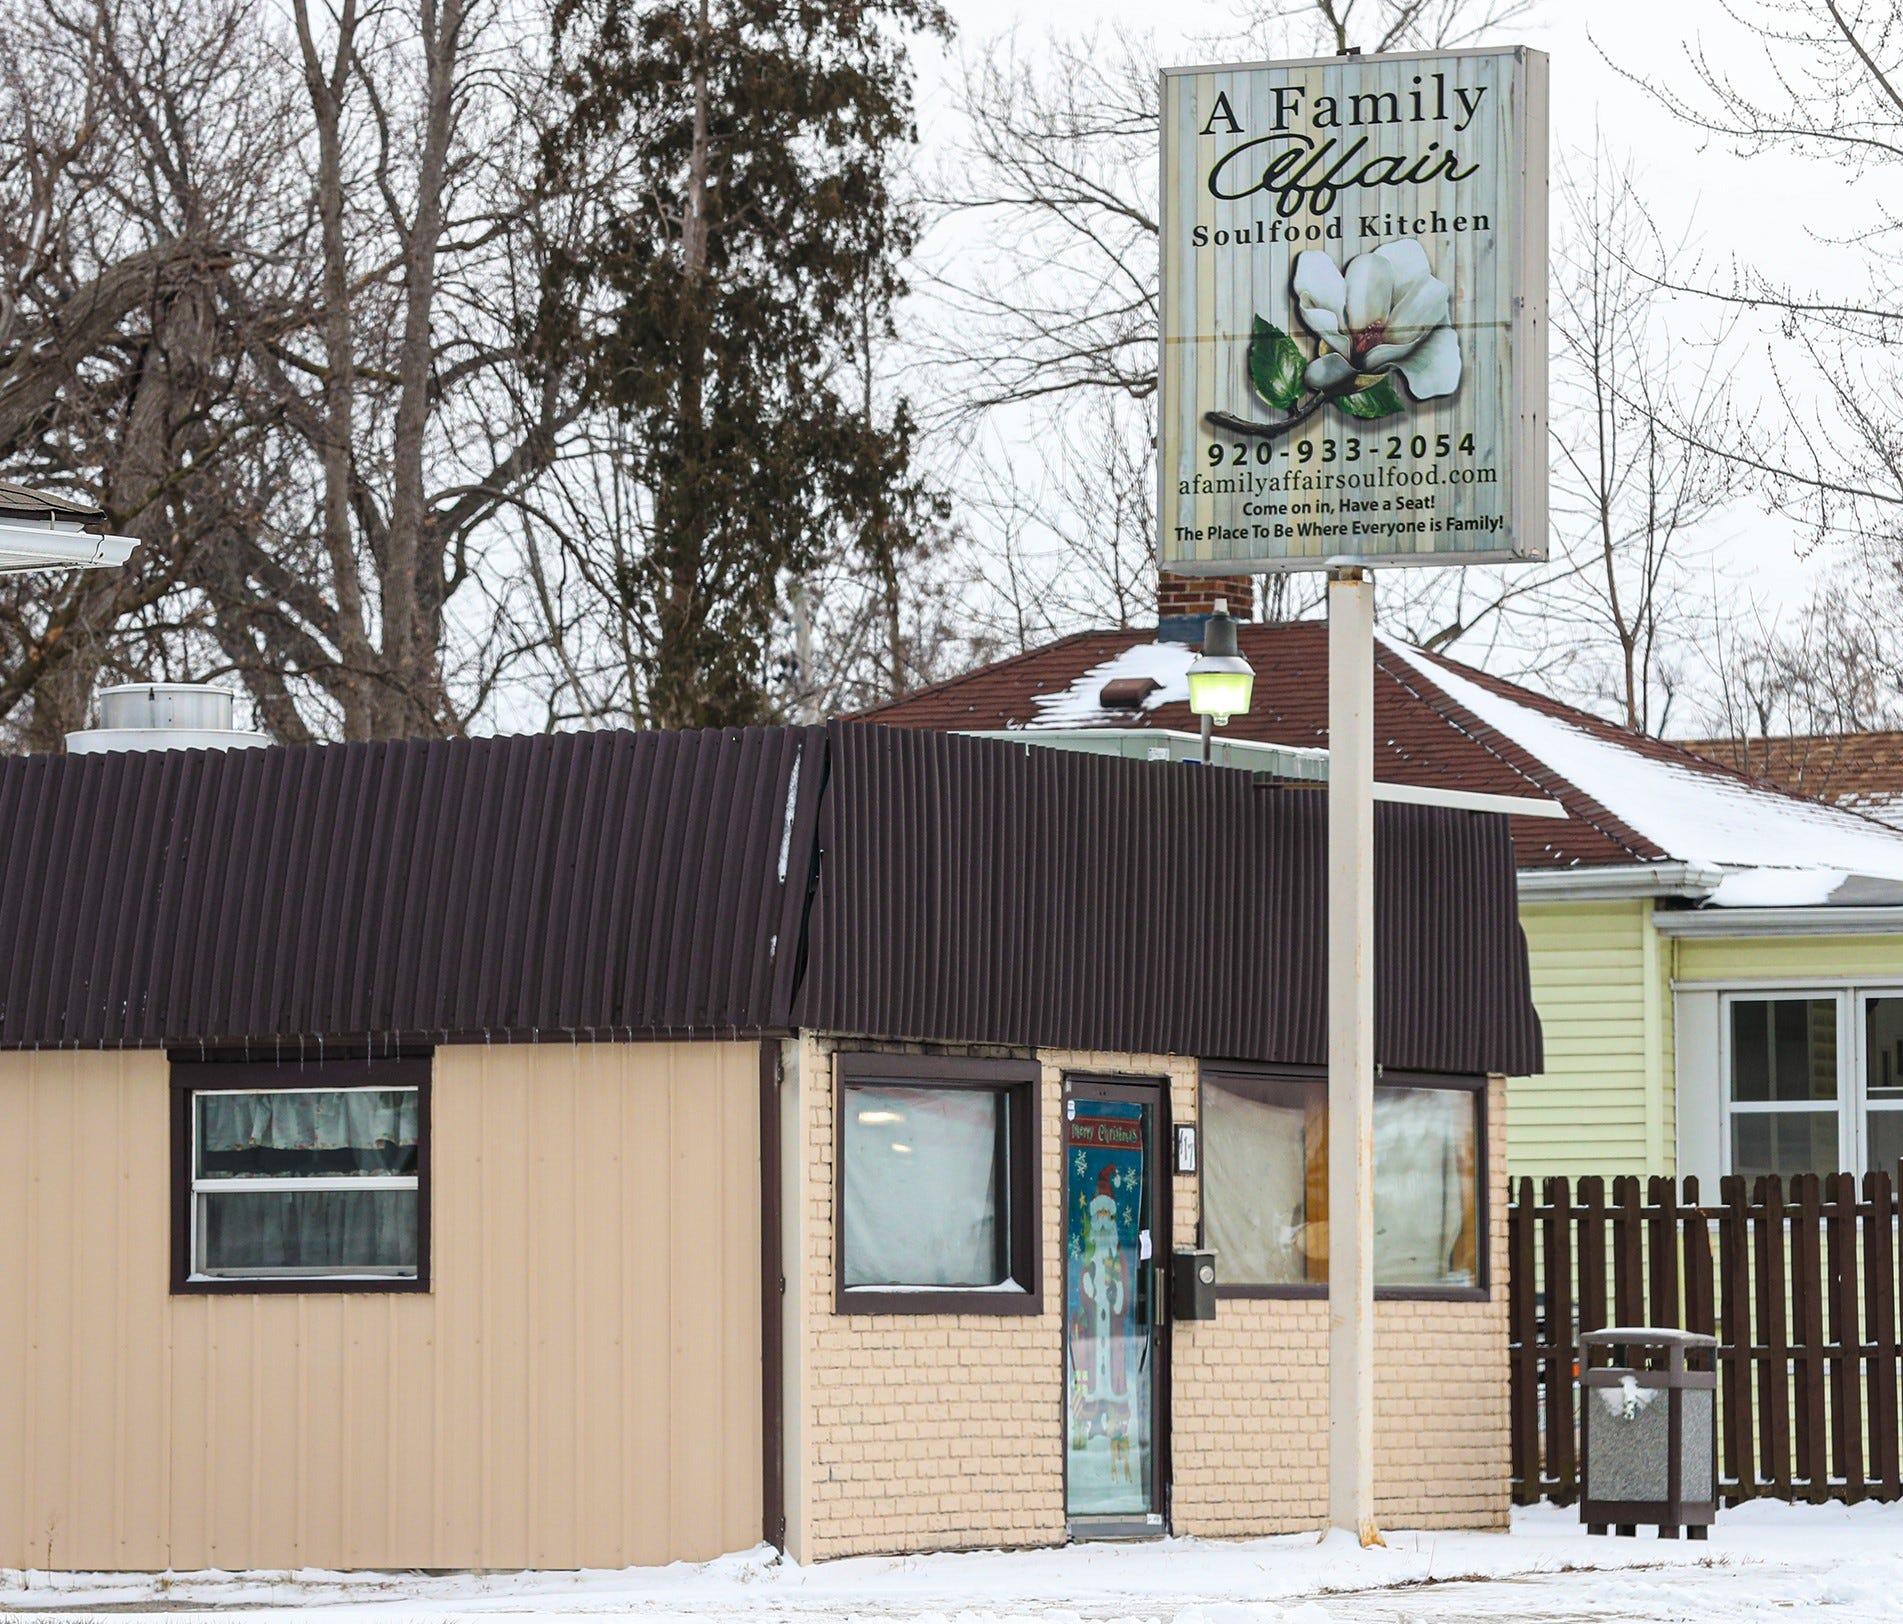 Fond Du Lac A Family Affair Soulfood Kitchen Set To Open Jan 26